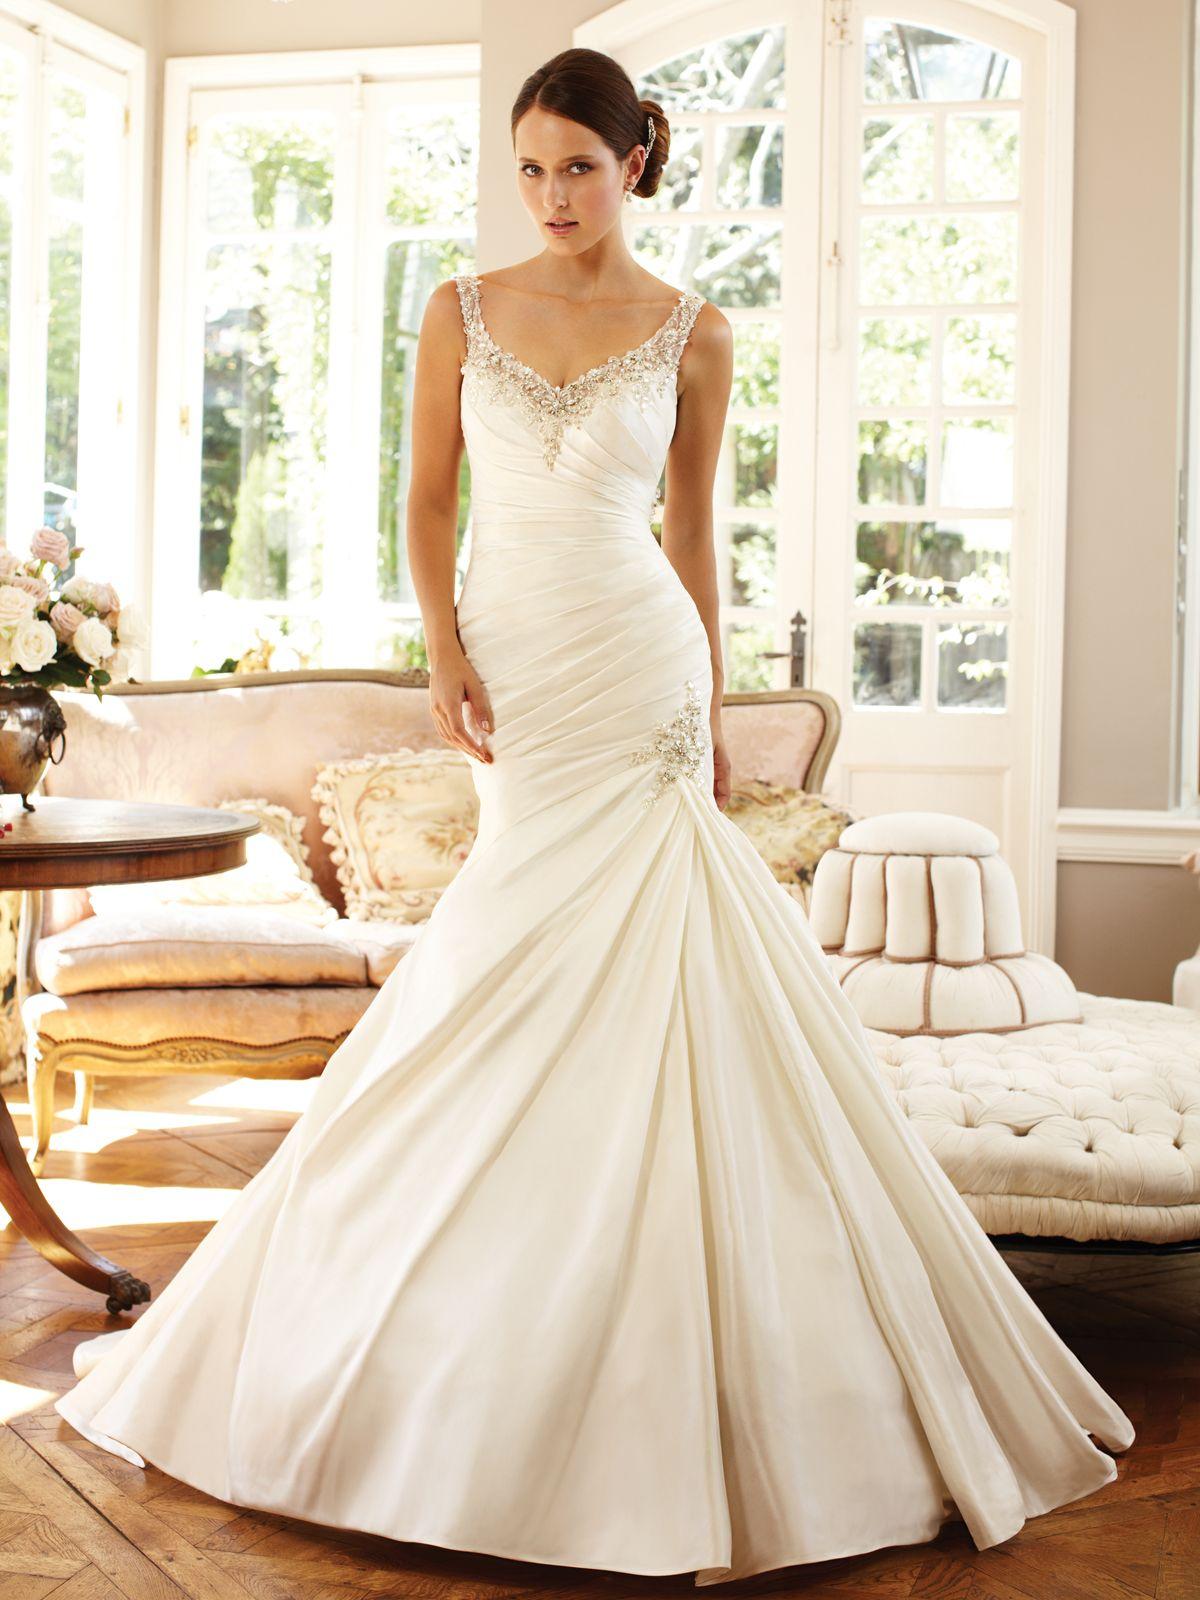 Sophia Tolli Fall 2013 Bridal Collection | Mermaid gown, Bridal ...